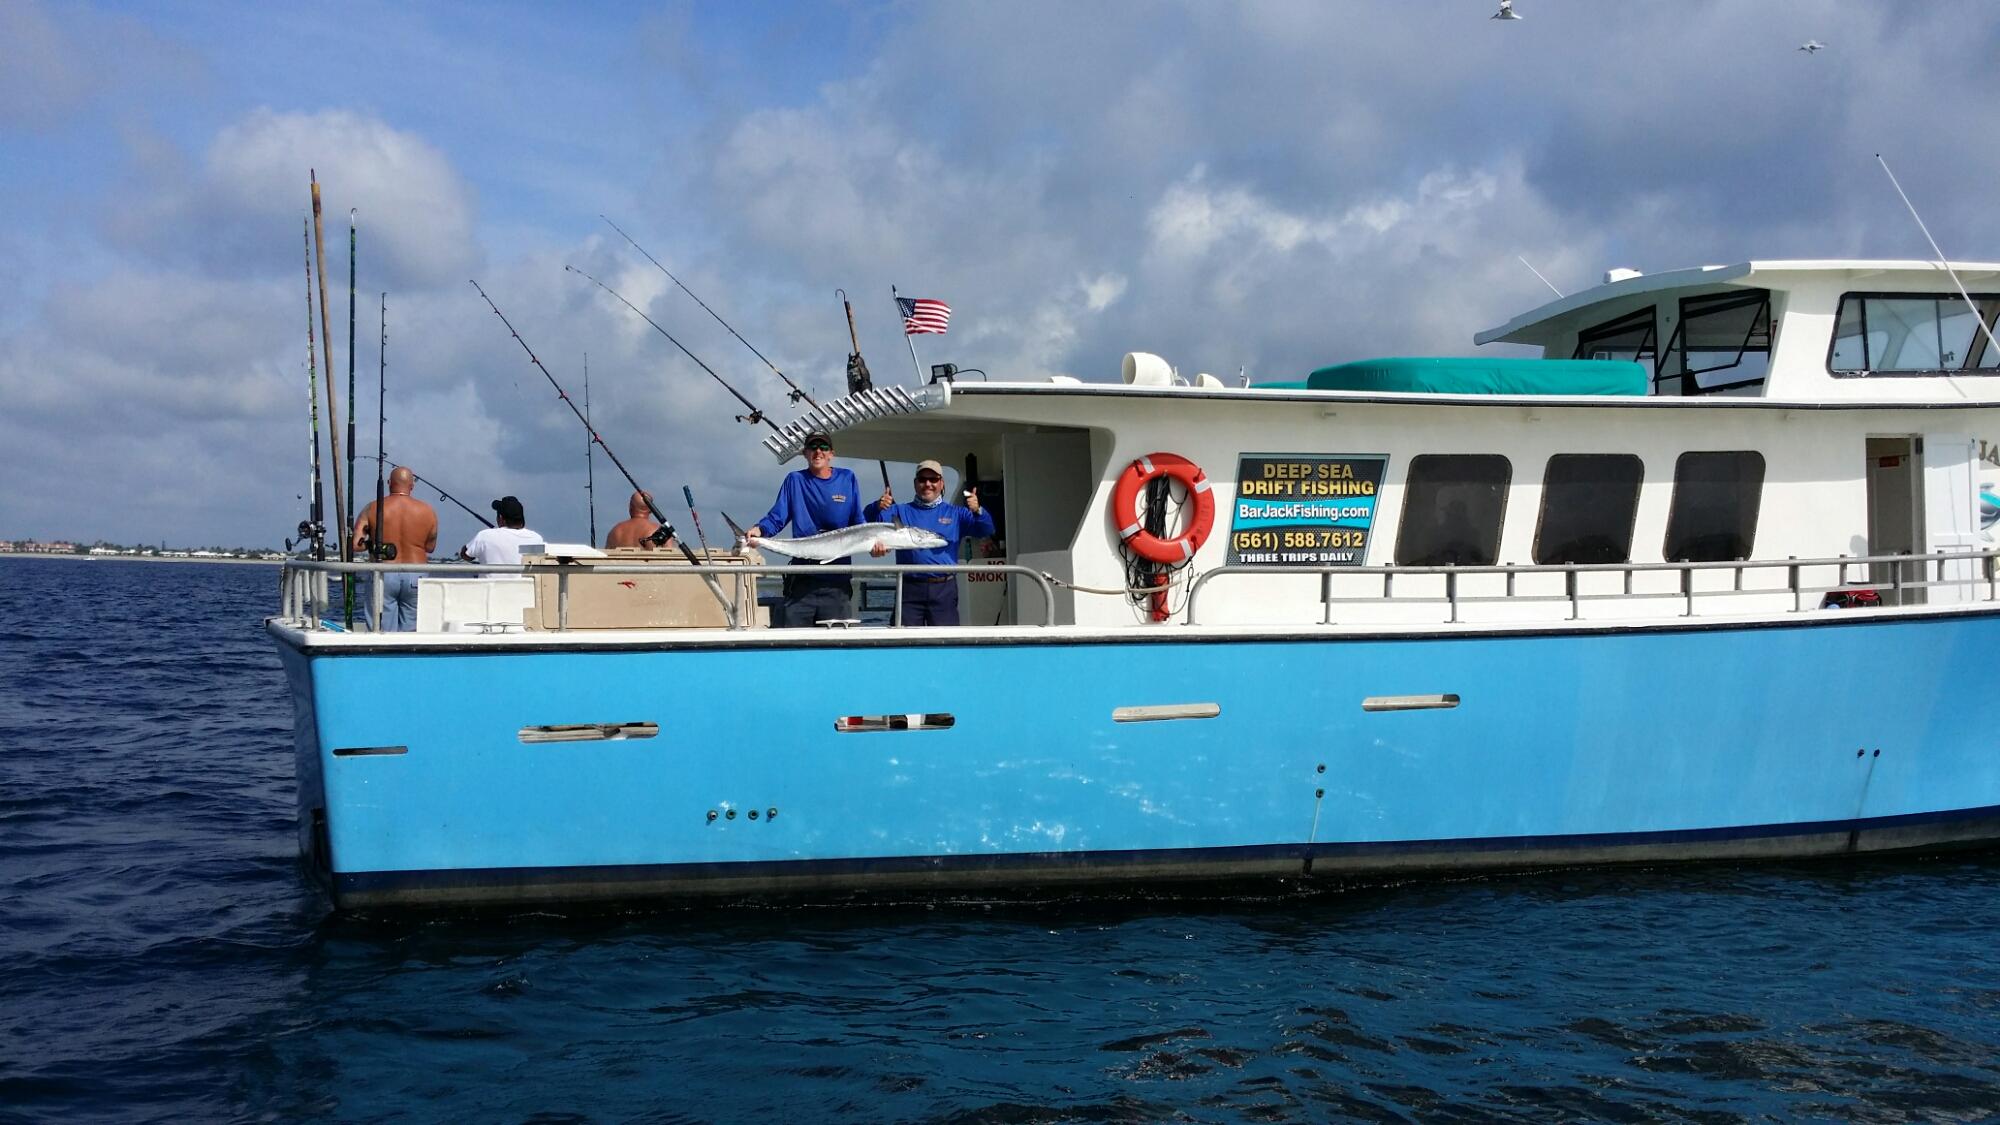 20150424 for Deep sea fishing west palm beach